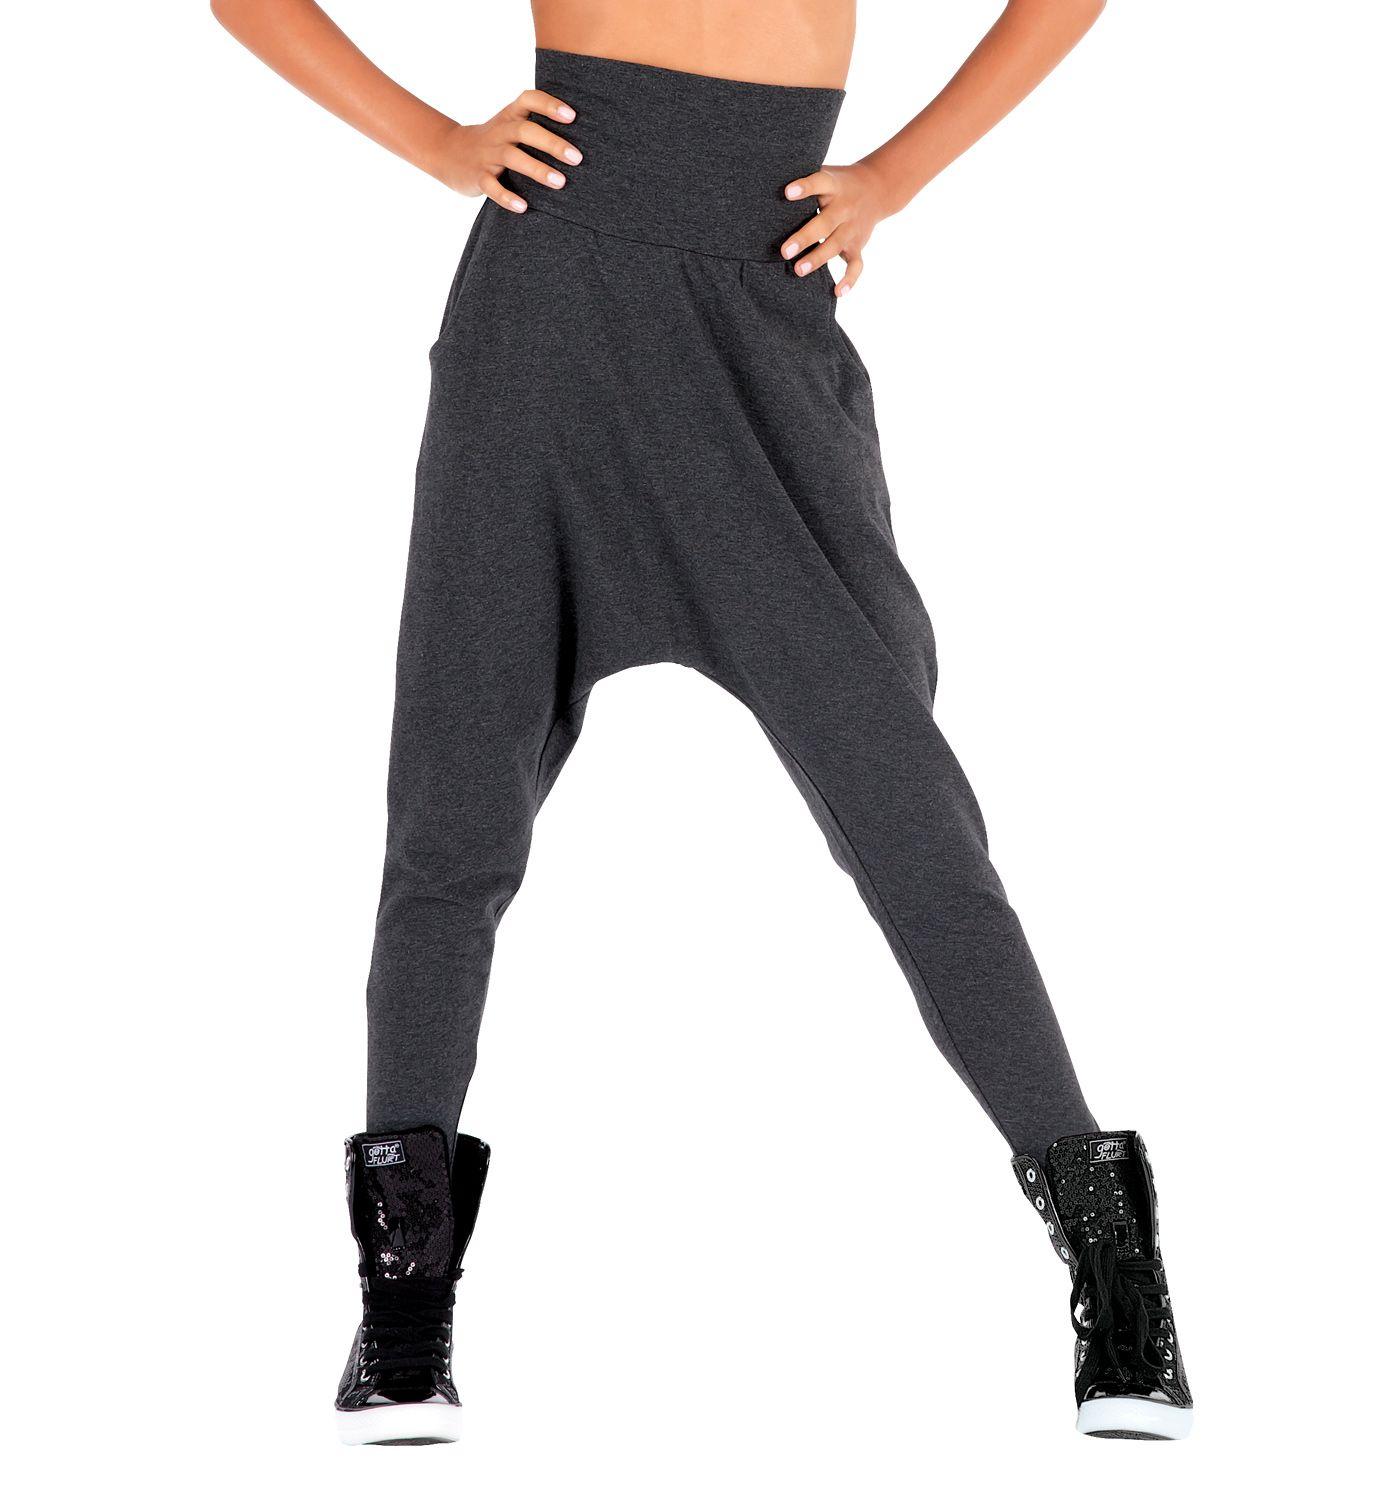 b73935d6314d Child Harem Pants Child Harem Pants - Style No N8639C Add to Teacher  Program class list Black Charcoal Garnet Teal Hover to view zoom